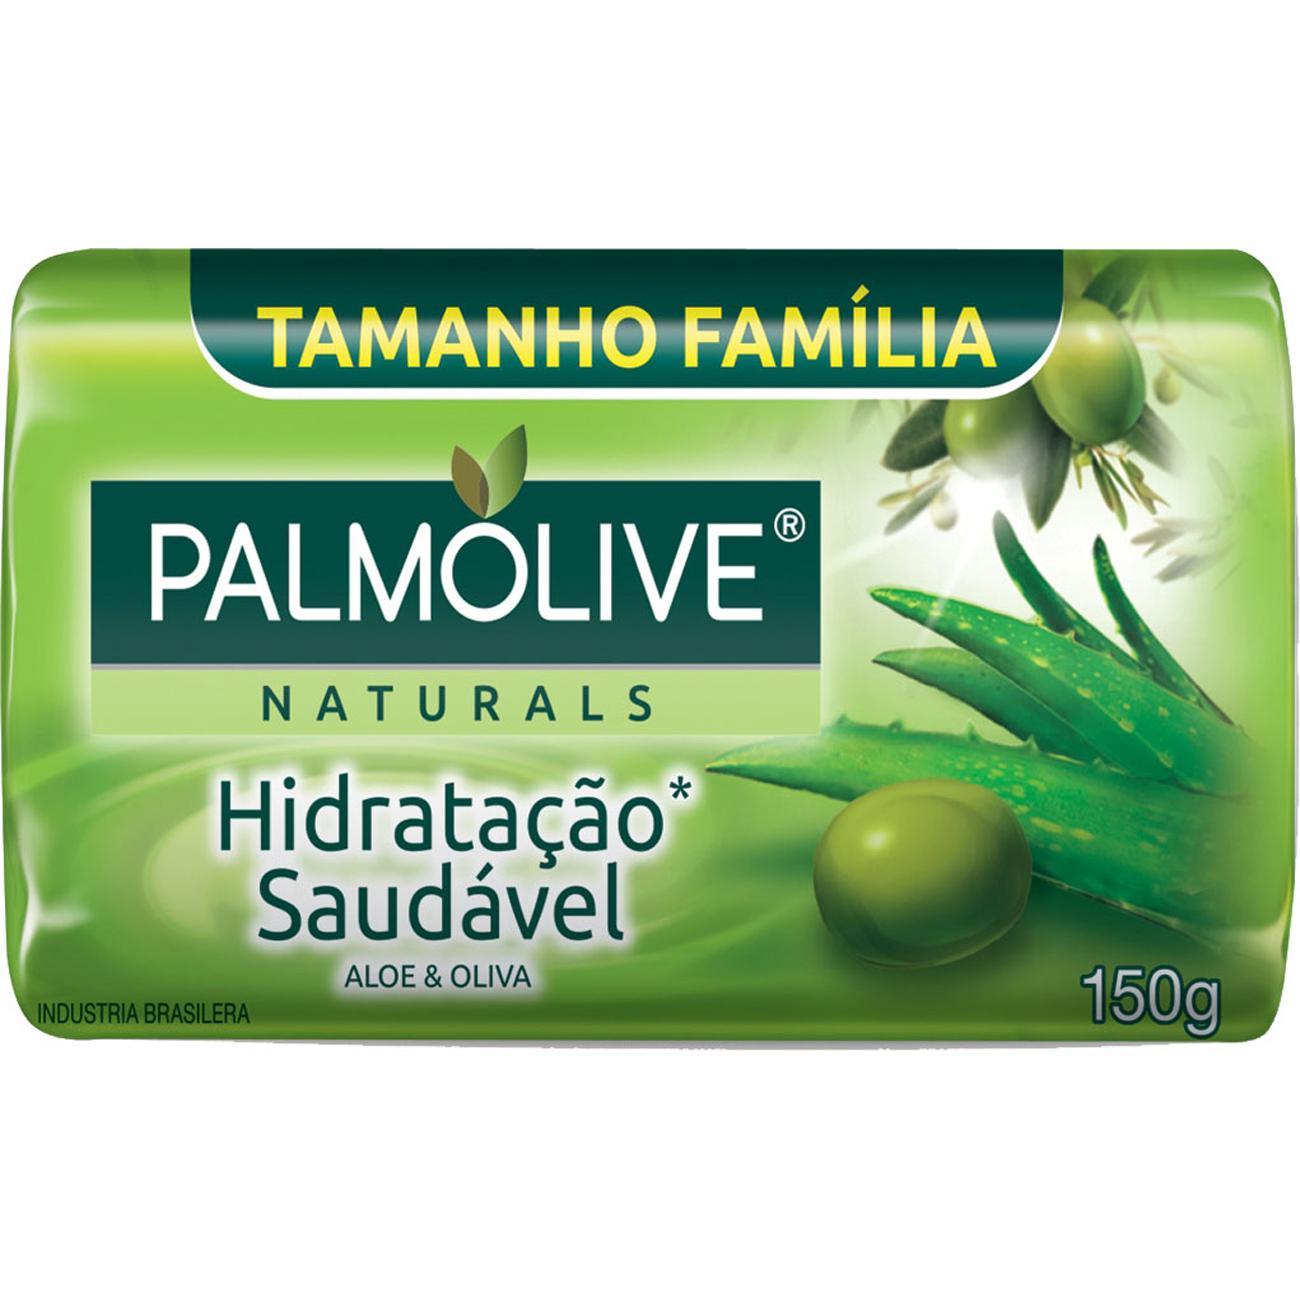 Sabonete em Barra Palmolive Naturals Hidratacao Saud